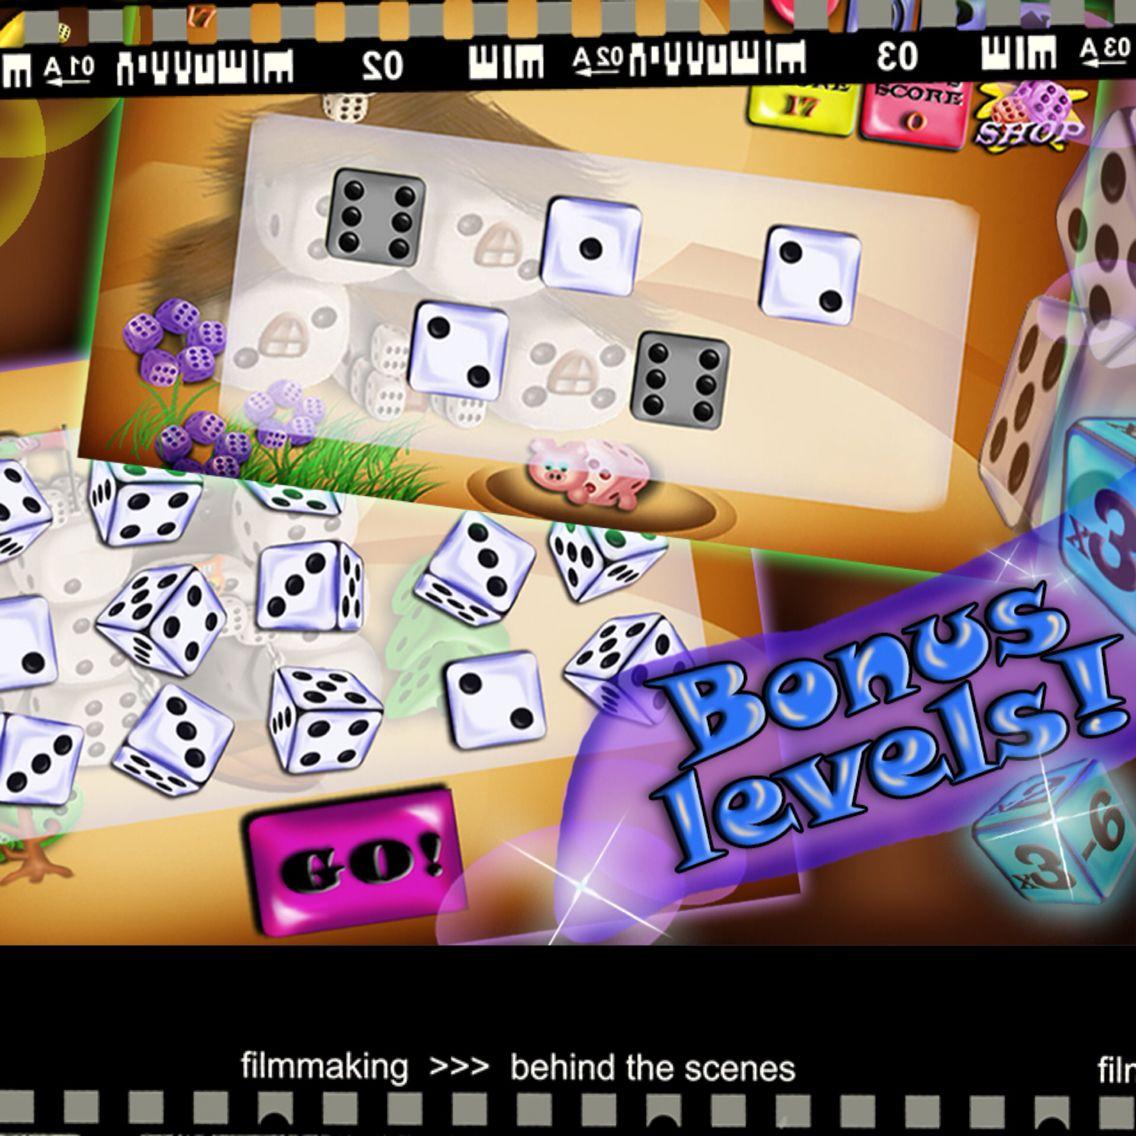 Bonus levels!! bonus yatzy yahtzee cool game play